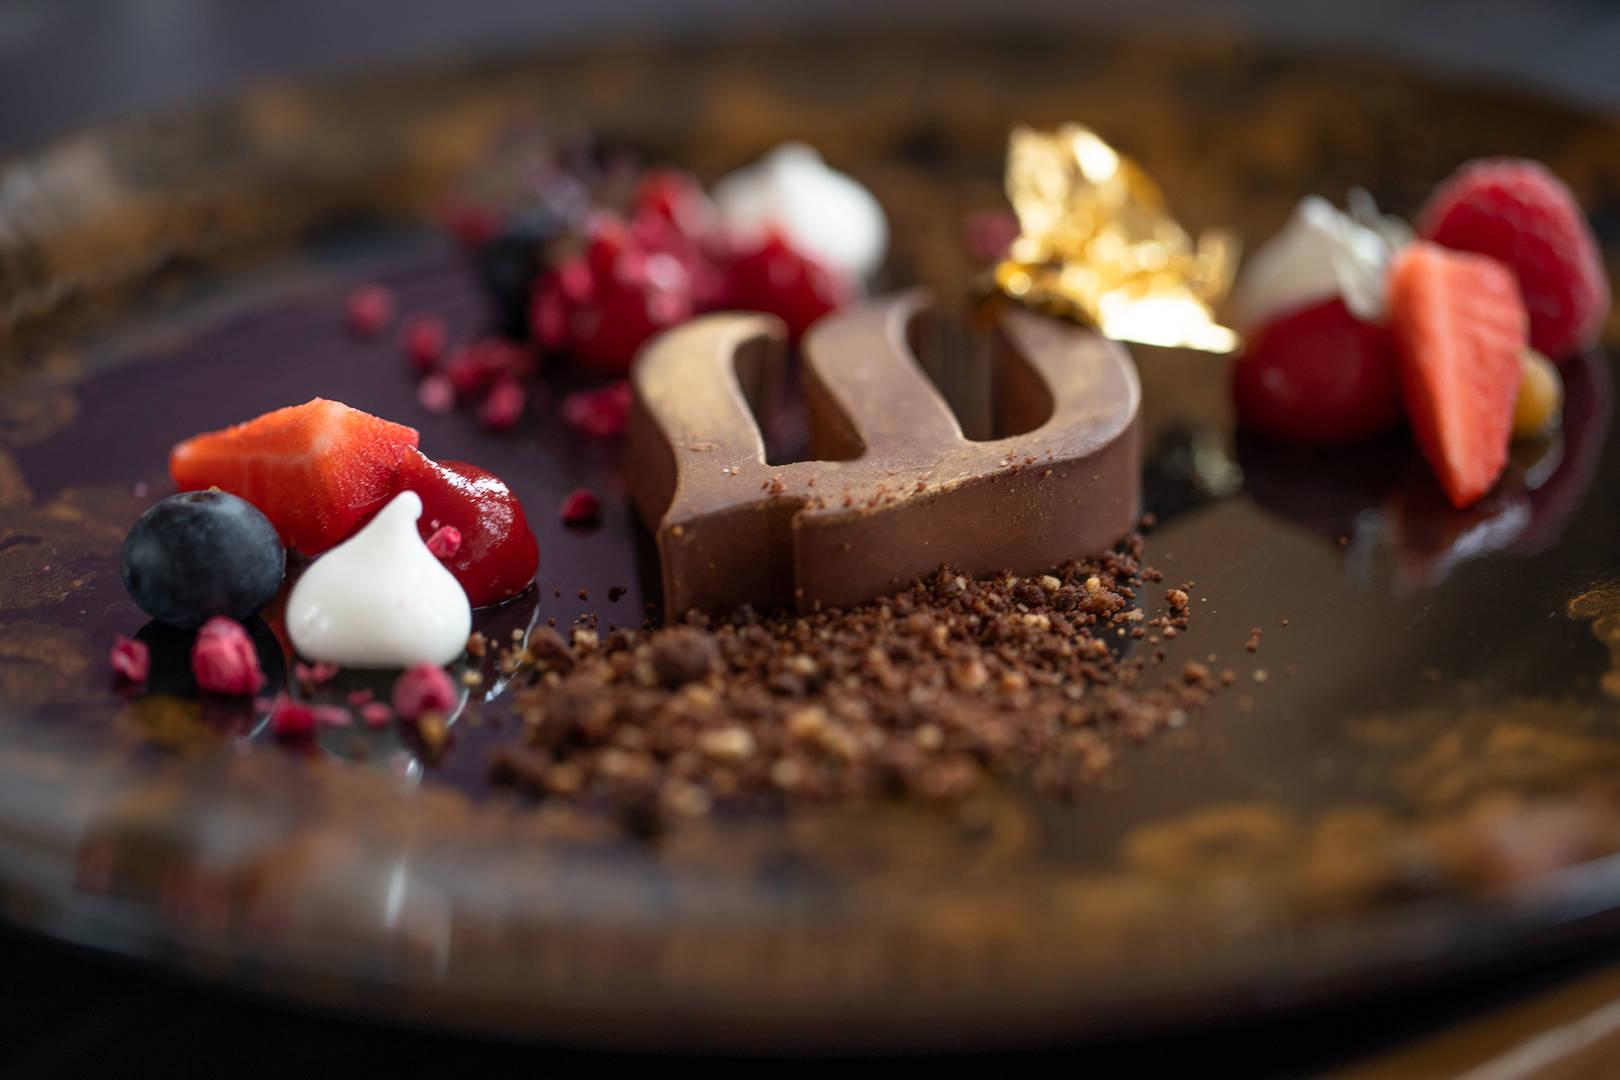 https://cdn.jumeirah.com/-/mediadh/DH/Hospitality/Jumeirah/Restaurants/Frankfurt/Frankfurt-Max-On-One-Grill-Room/Restaurant-Gallery/Jumeirah-Frankfurt-Max-on-One-Grillroom-Beacon-Dessert_6-4.jpg?h=1080&w=1620&hash=C4B116DF40C9C2926DA913A1BB1EC9CD